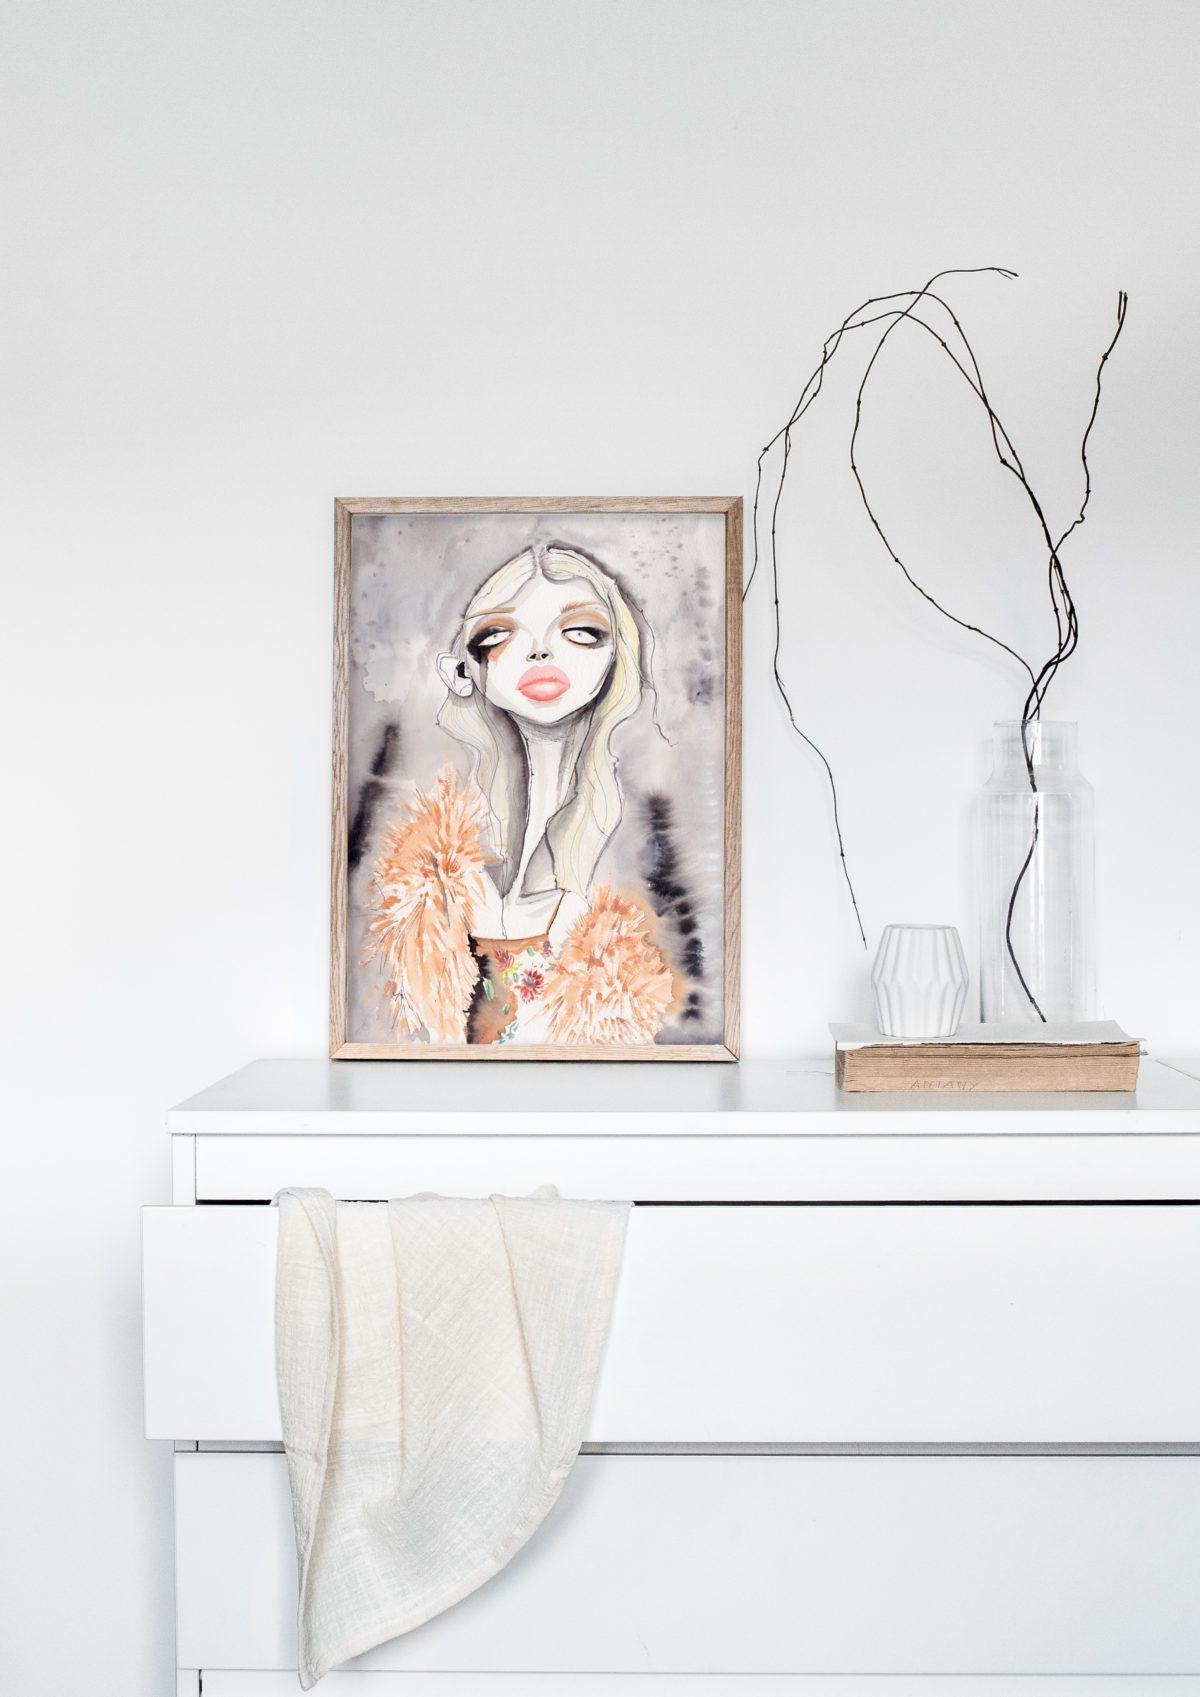 The minx jamie lee reardin artist art fashion design dwell in the pursuit